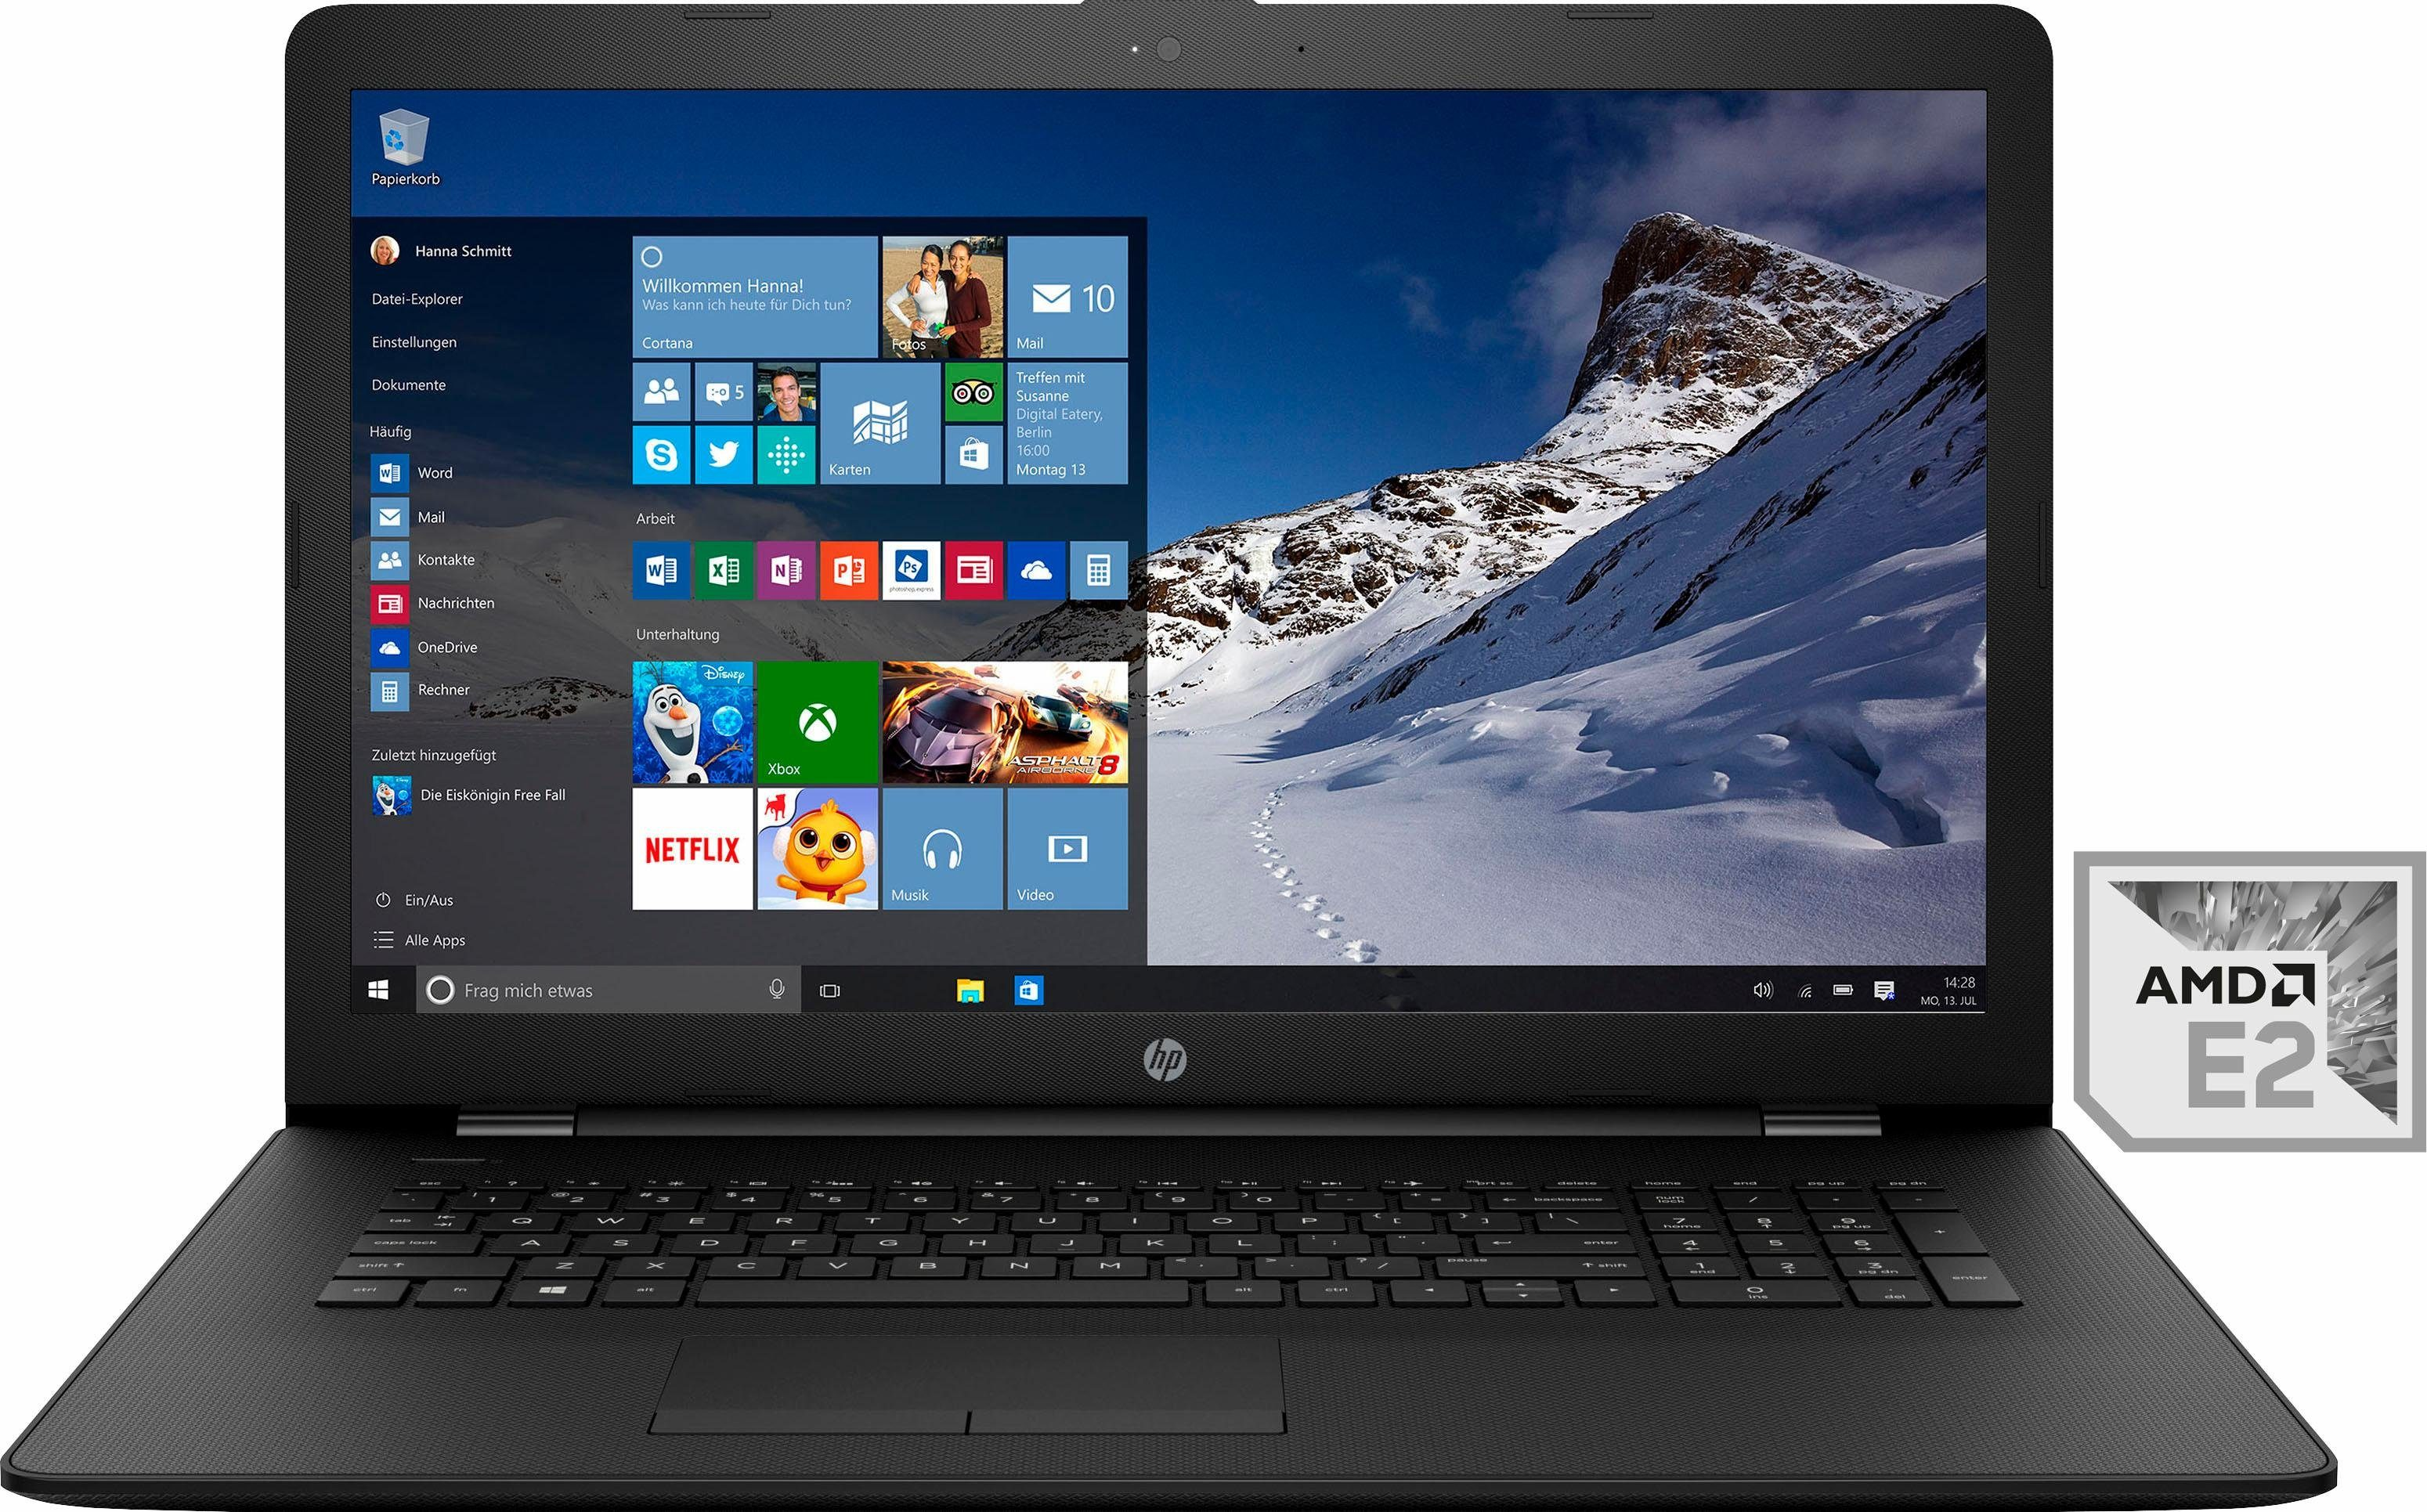 HP 17-ak060ng Notebook, AMD Dual Core E-2, 43,9 cm (17,3 Zoll), 1000 GB Speicher, 4096 MB DDR4-SDRAM